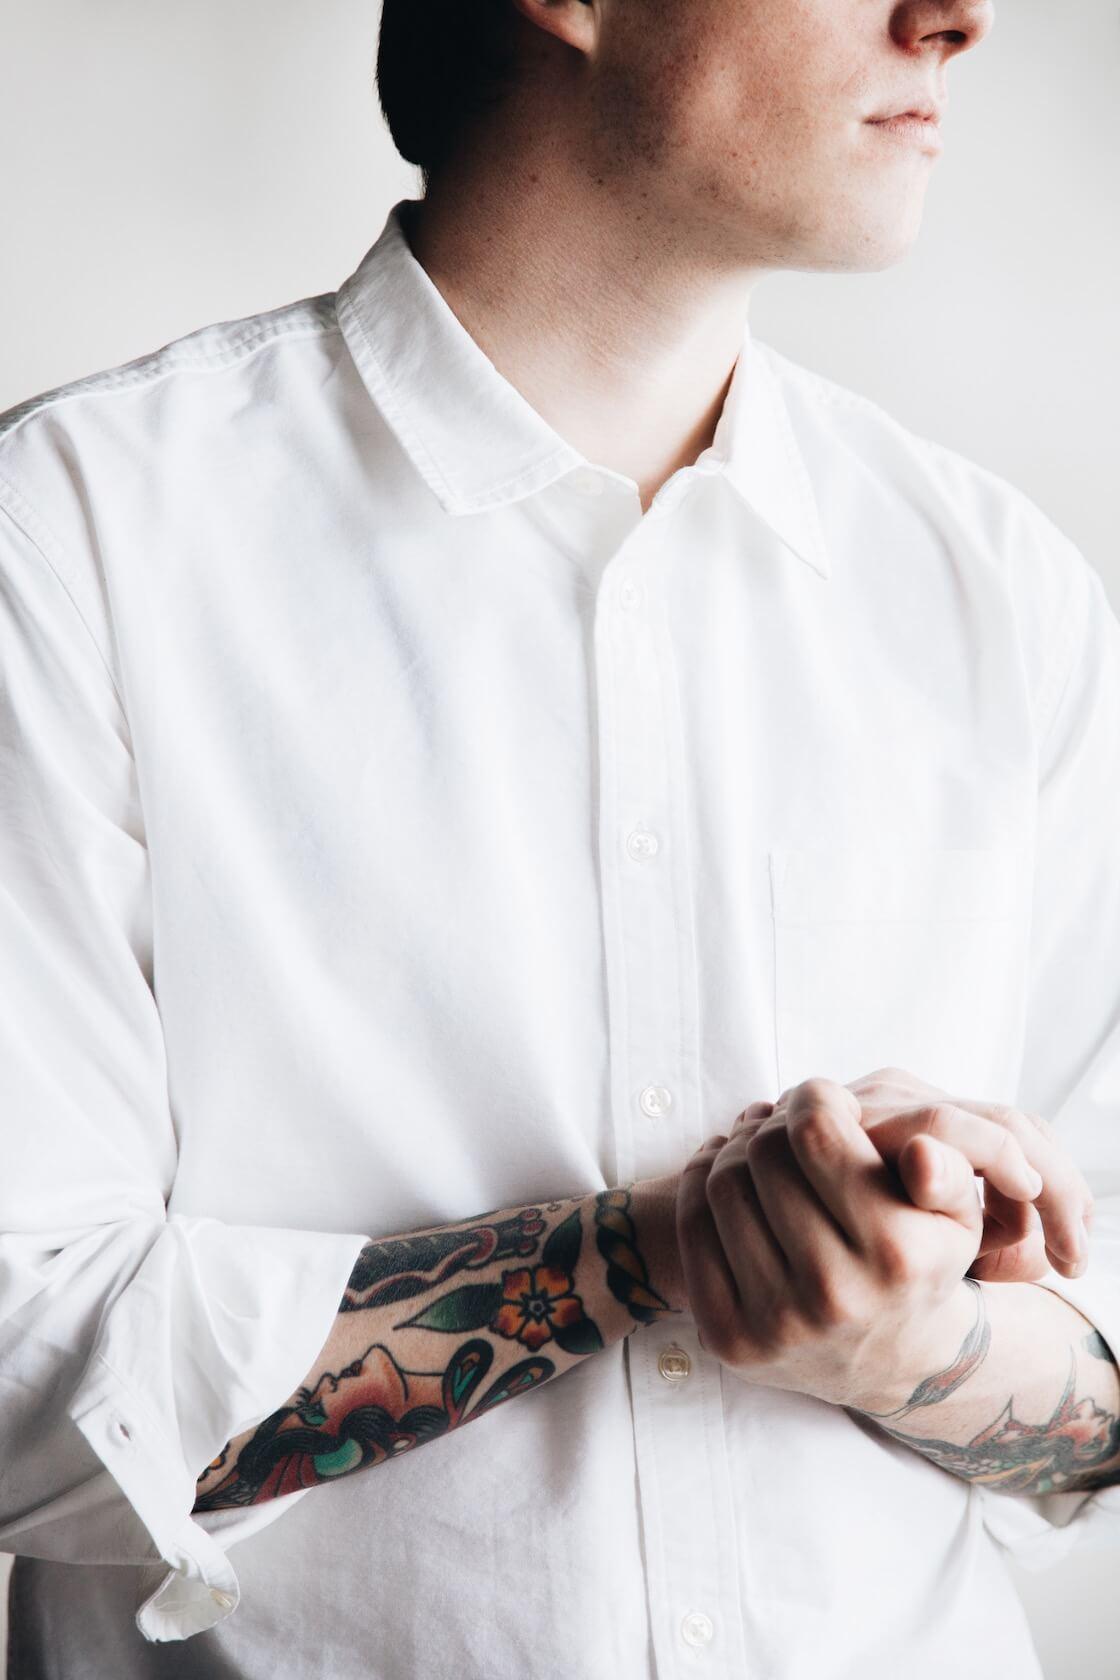 canoe club x corridor white oxford shirt on body